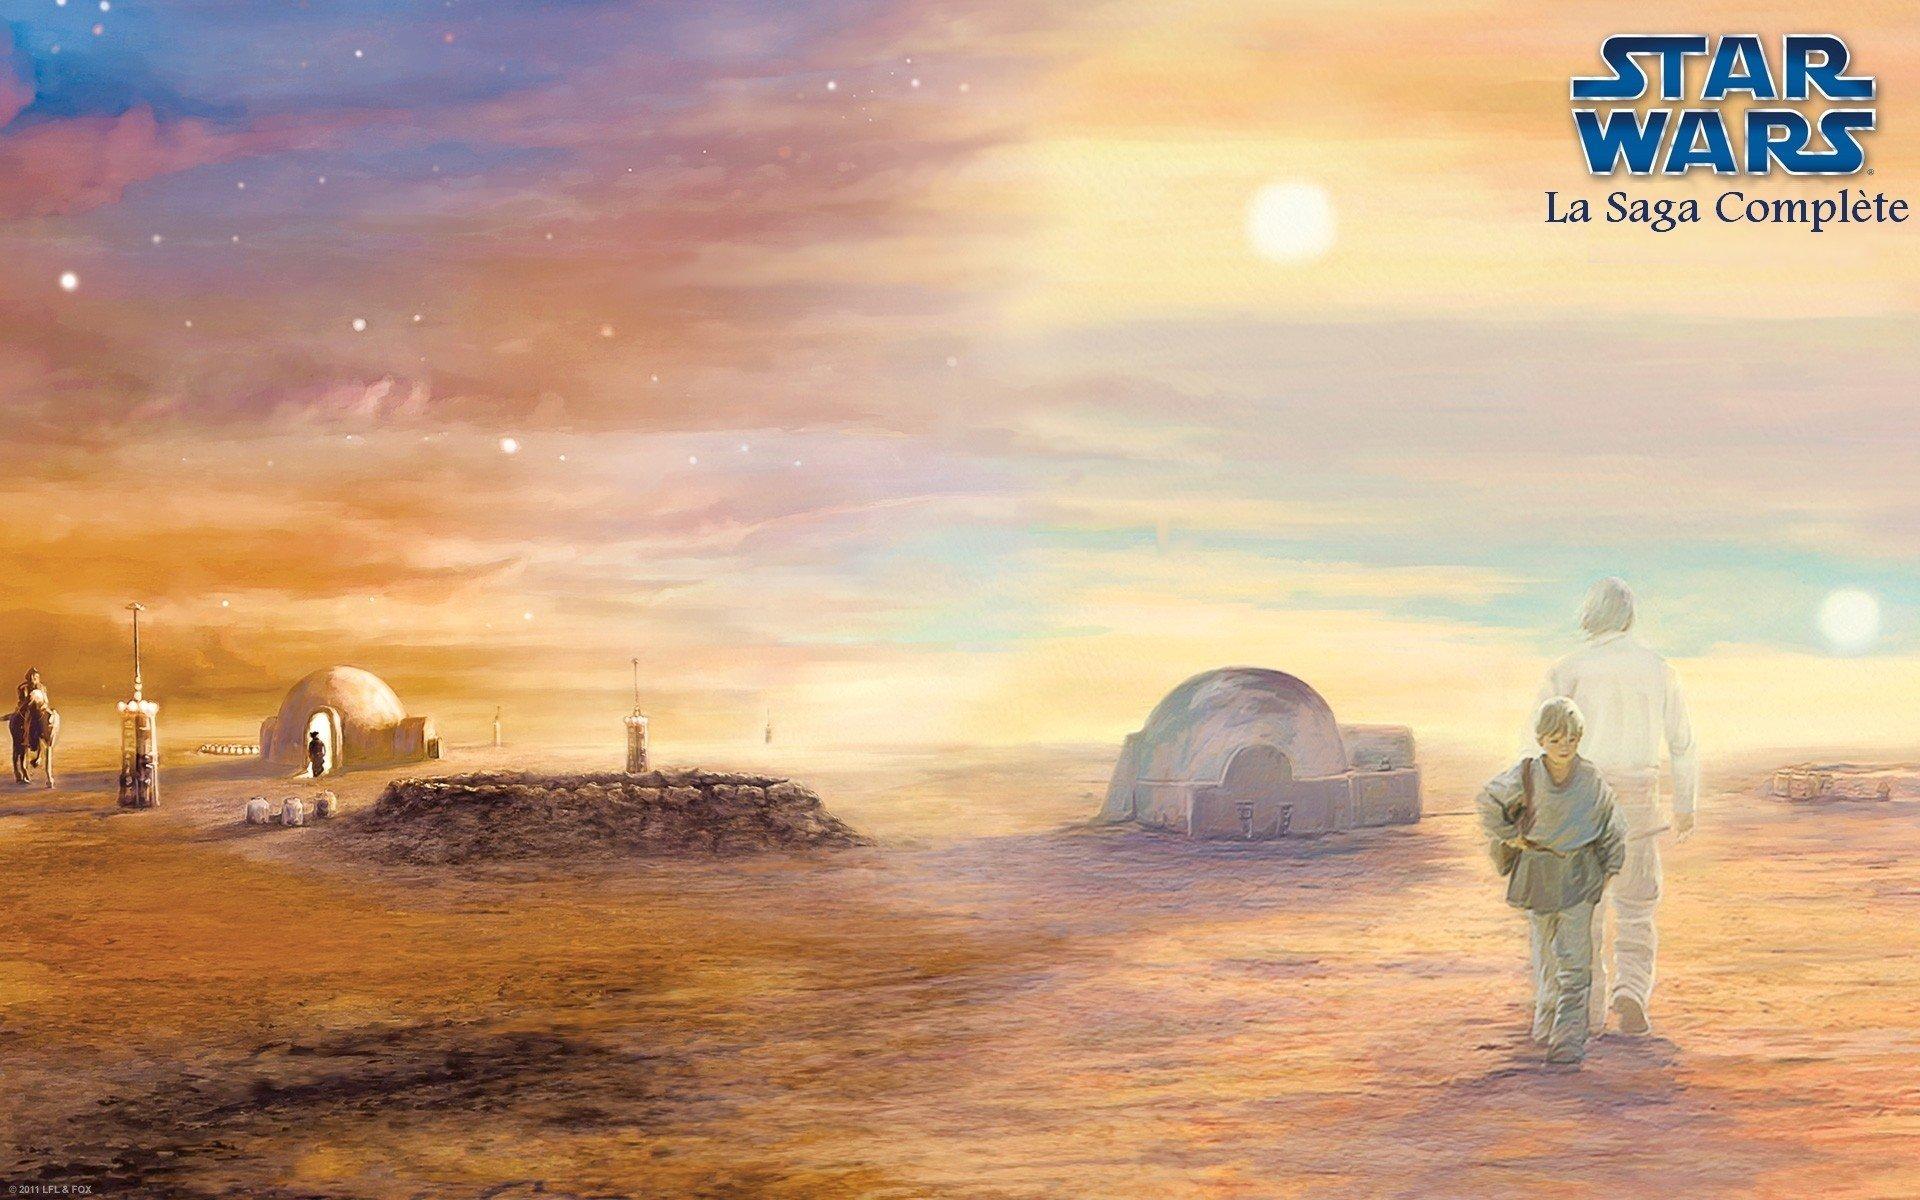 star wars attack clones sci fi action futuristic movie film poster wallpaper 1920x1200 254478 wallpaperup